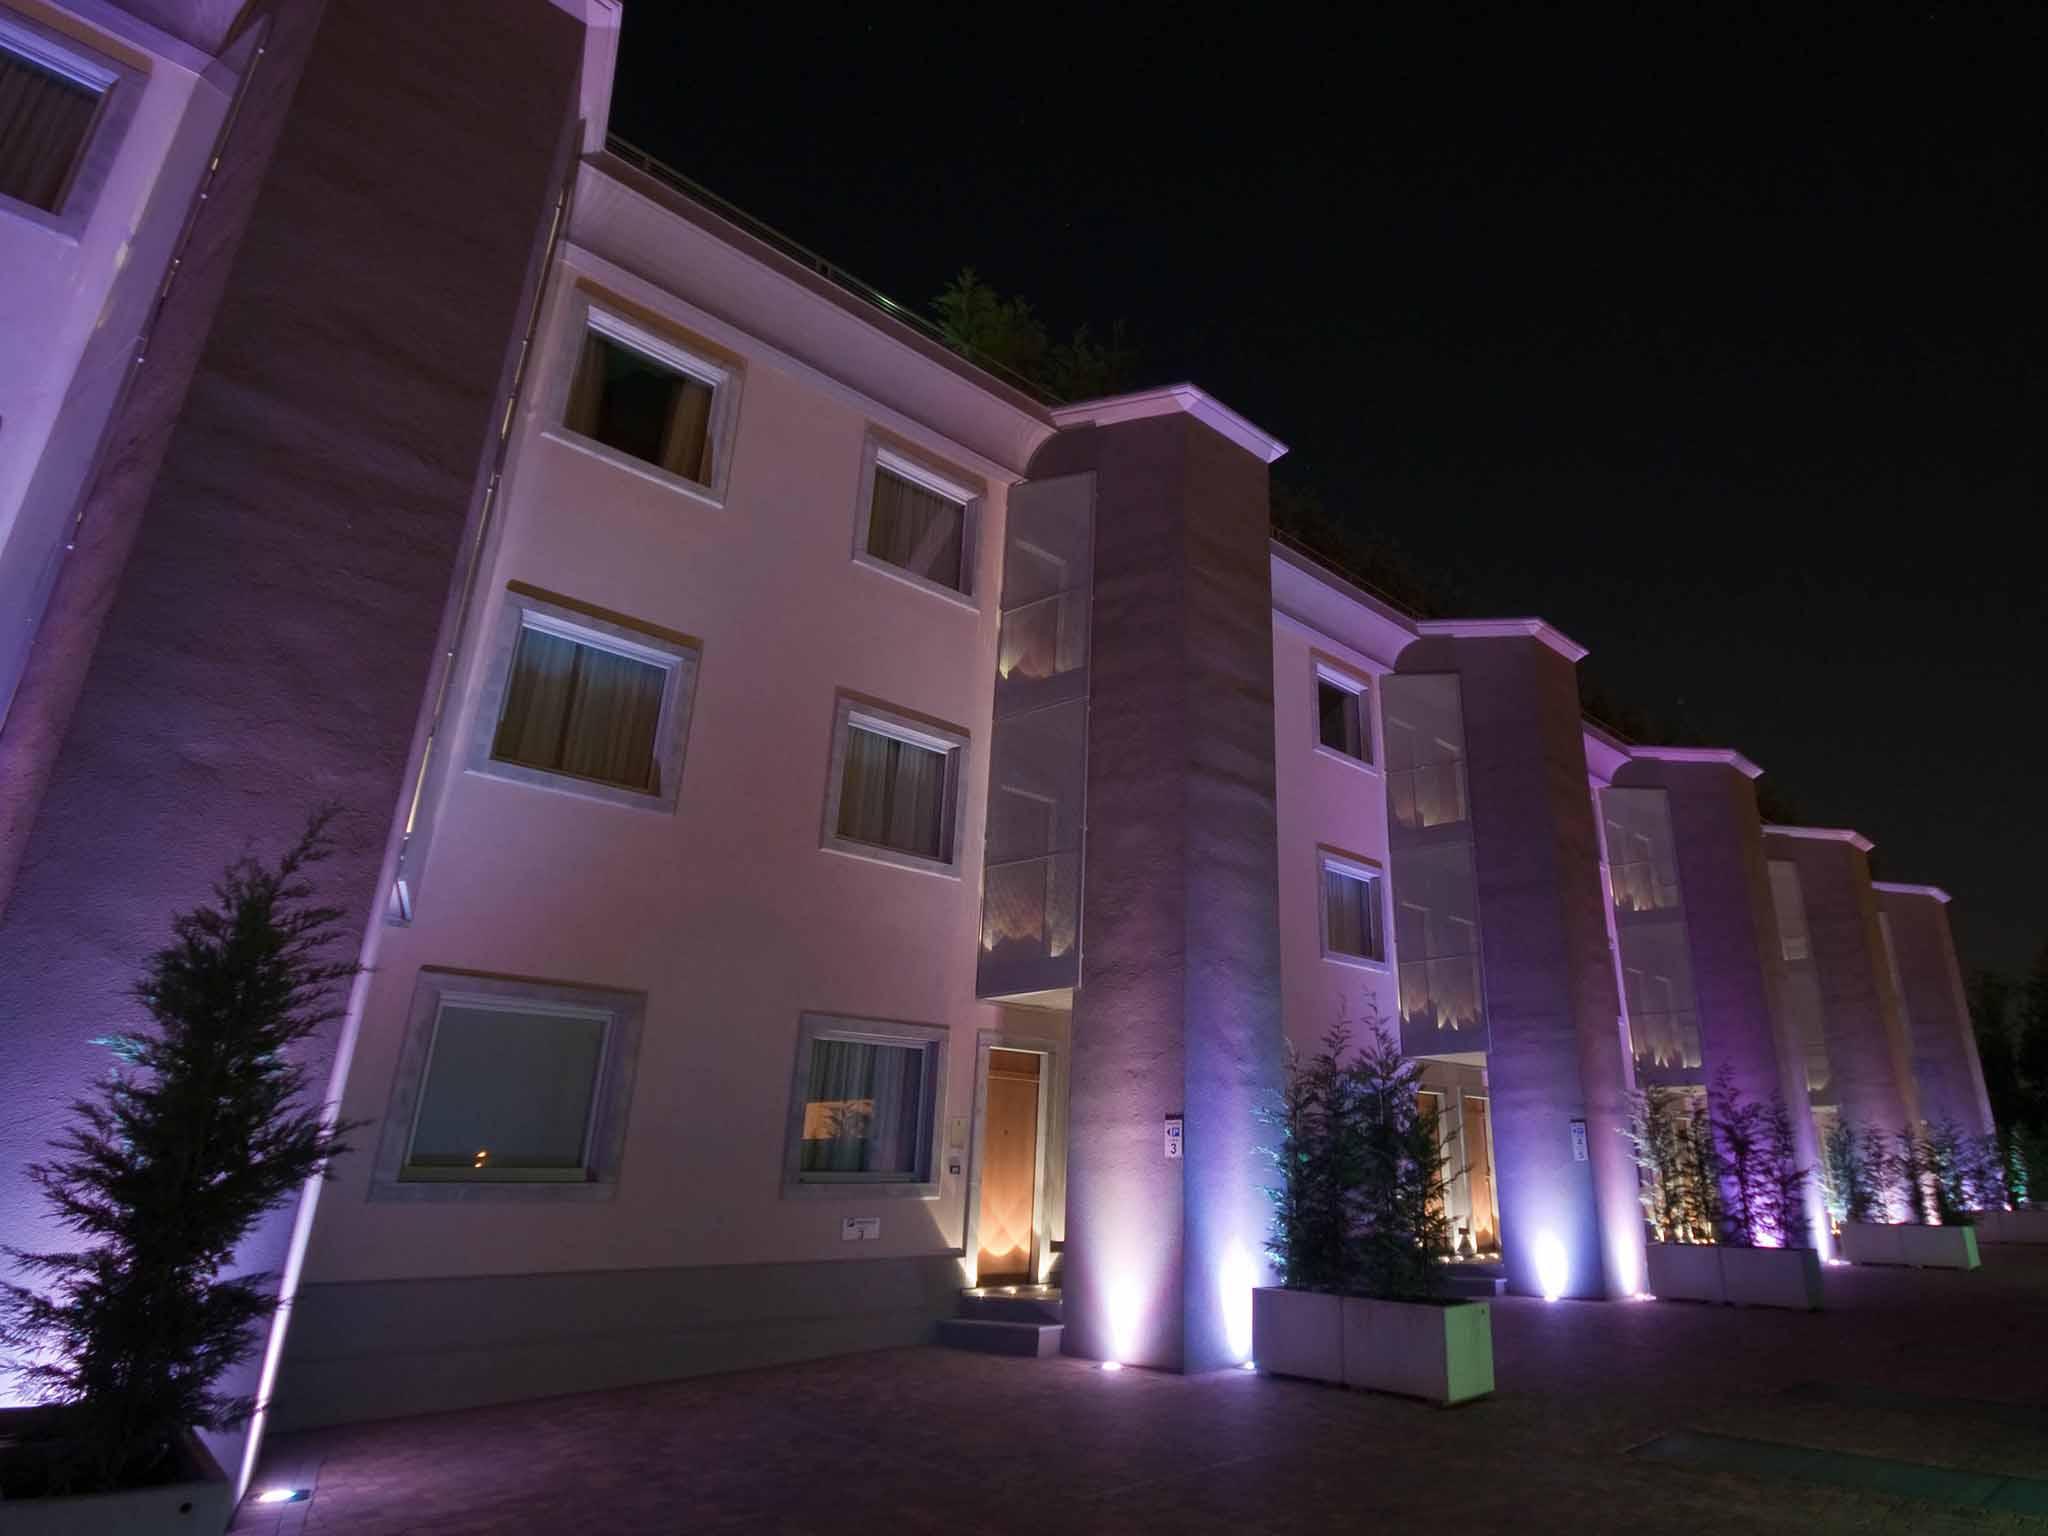 Hotels In Winter Garden Part - 21: ... Hotel - Winter Garden Hotel Bergamo Airport ...